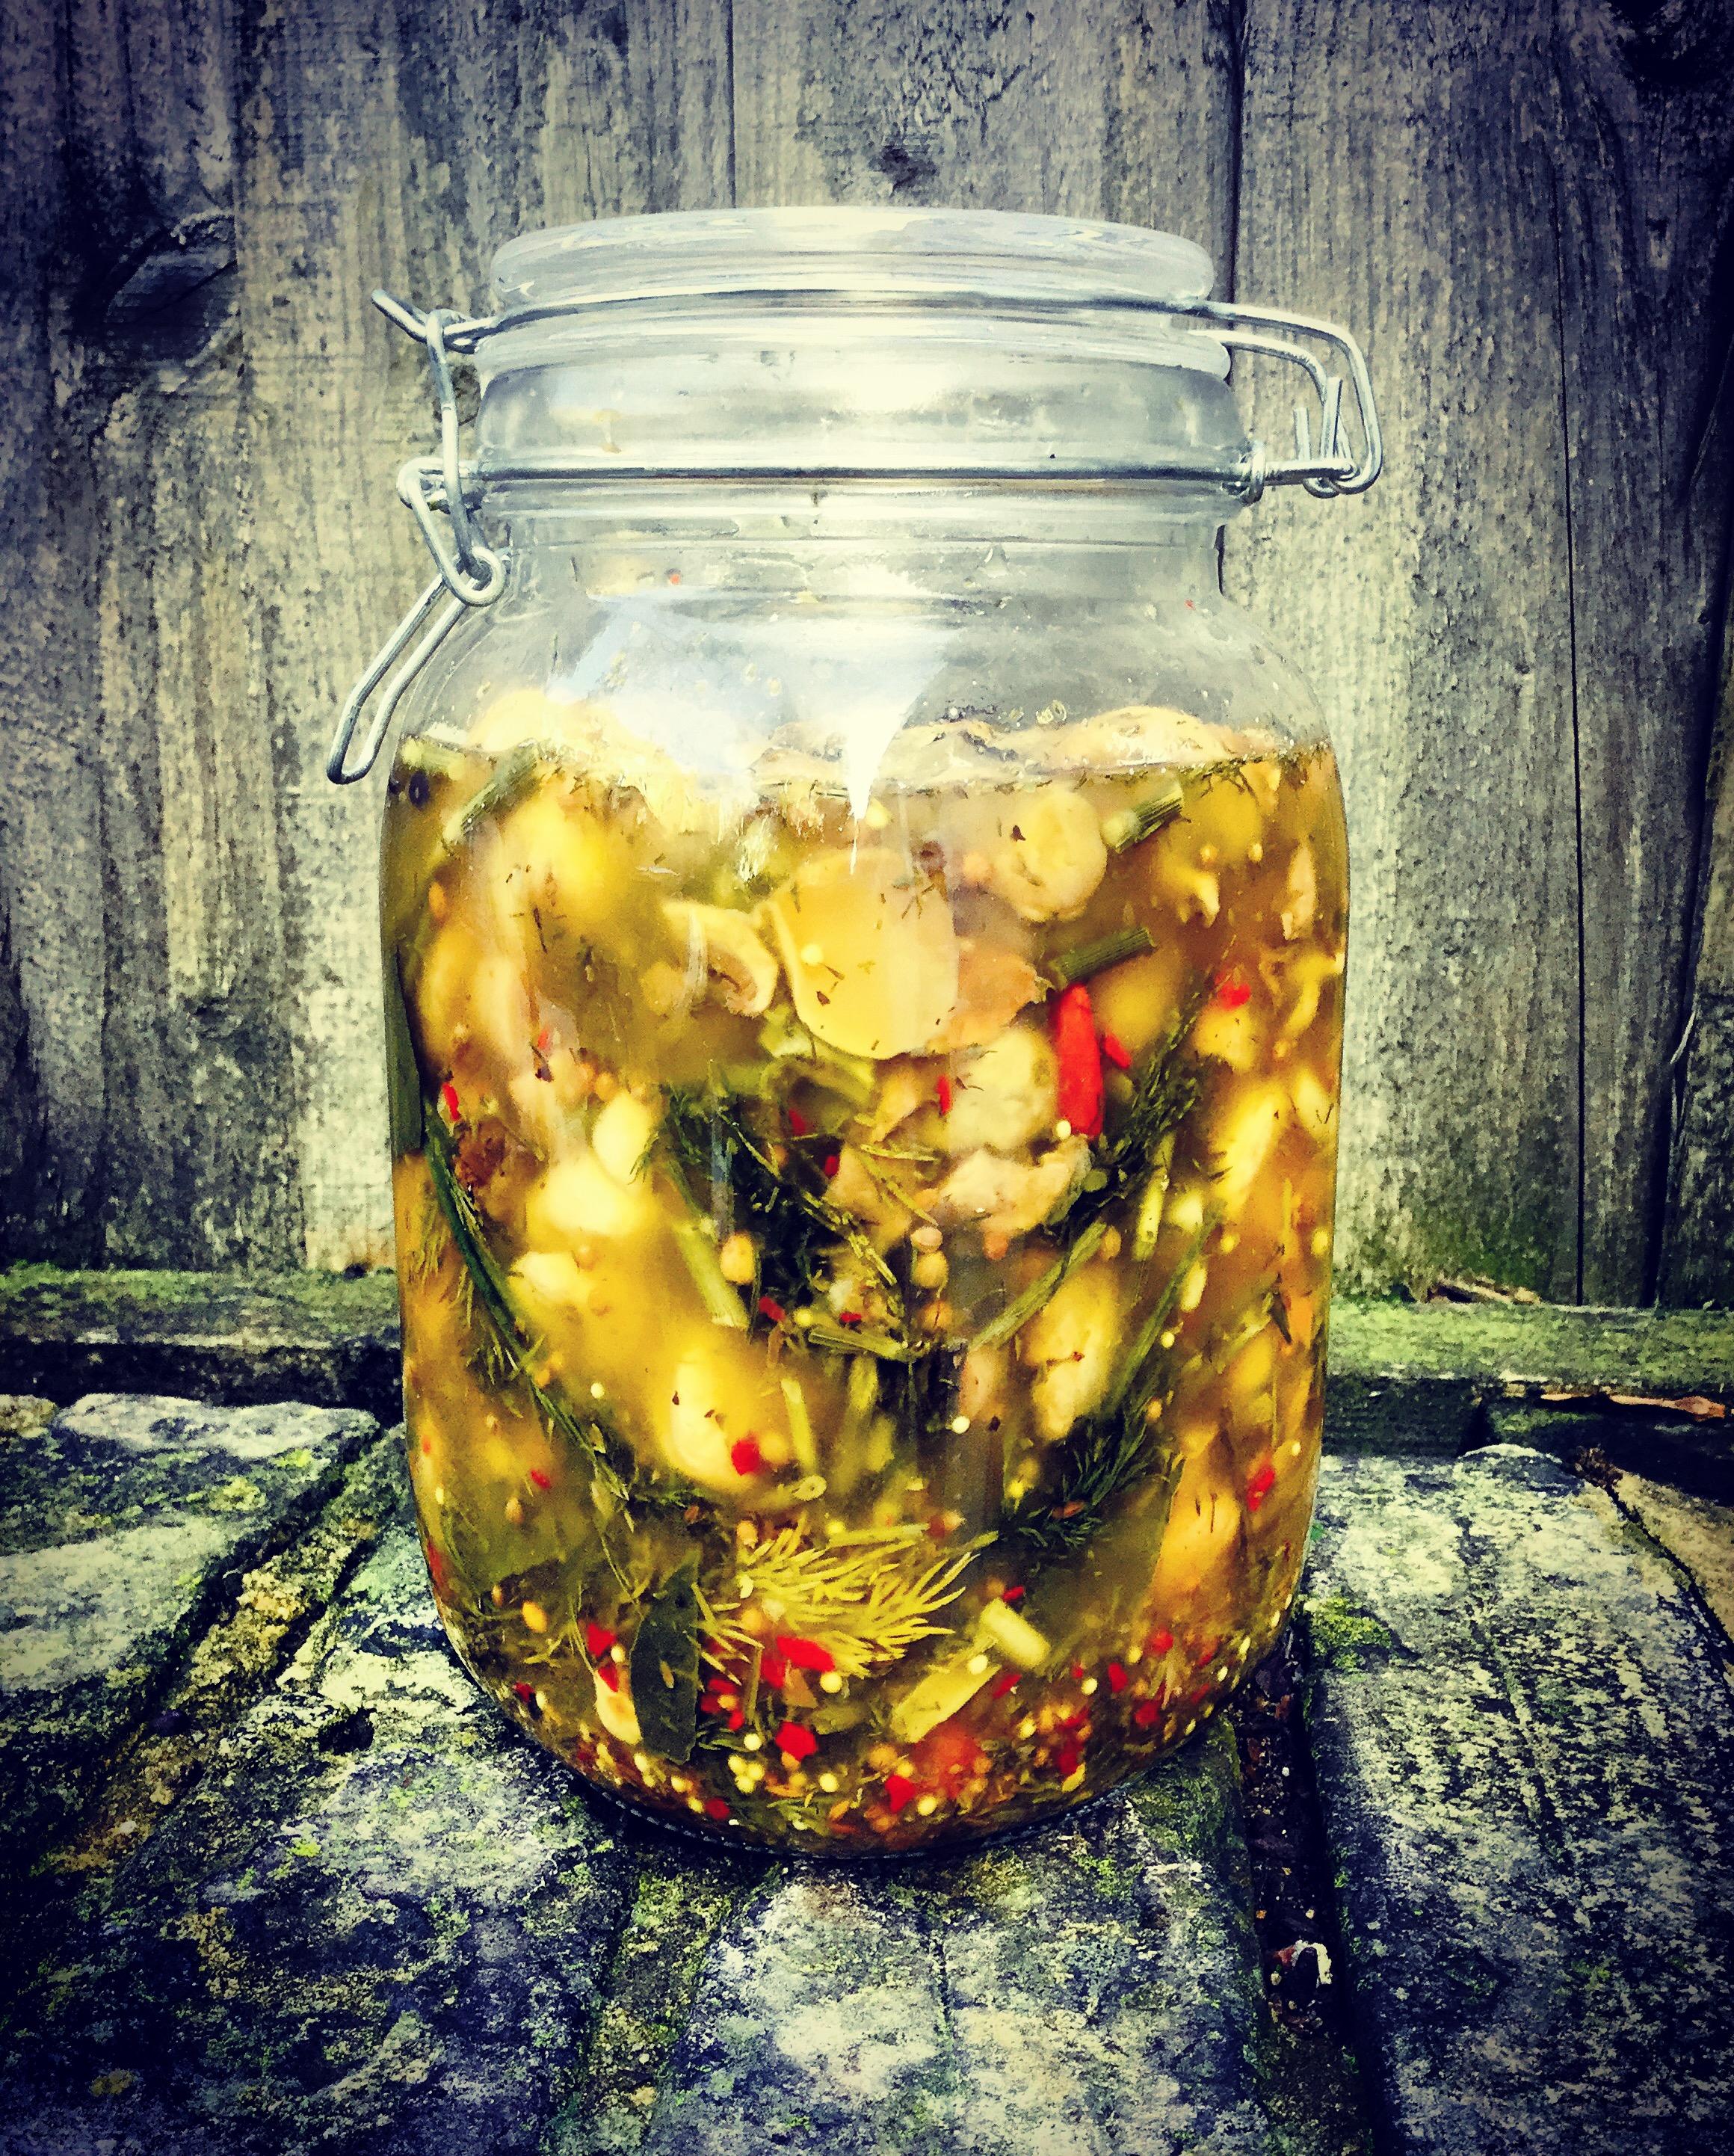 Best Fermented Mushroom Recipe